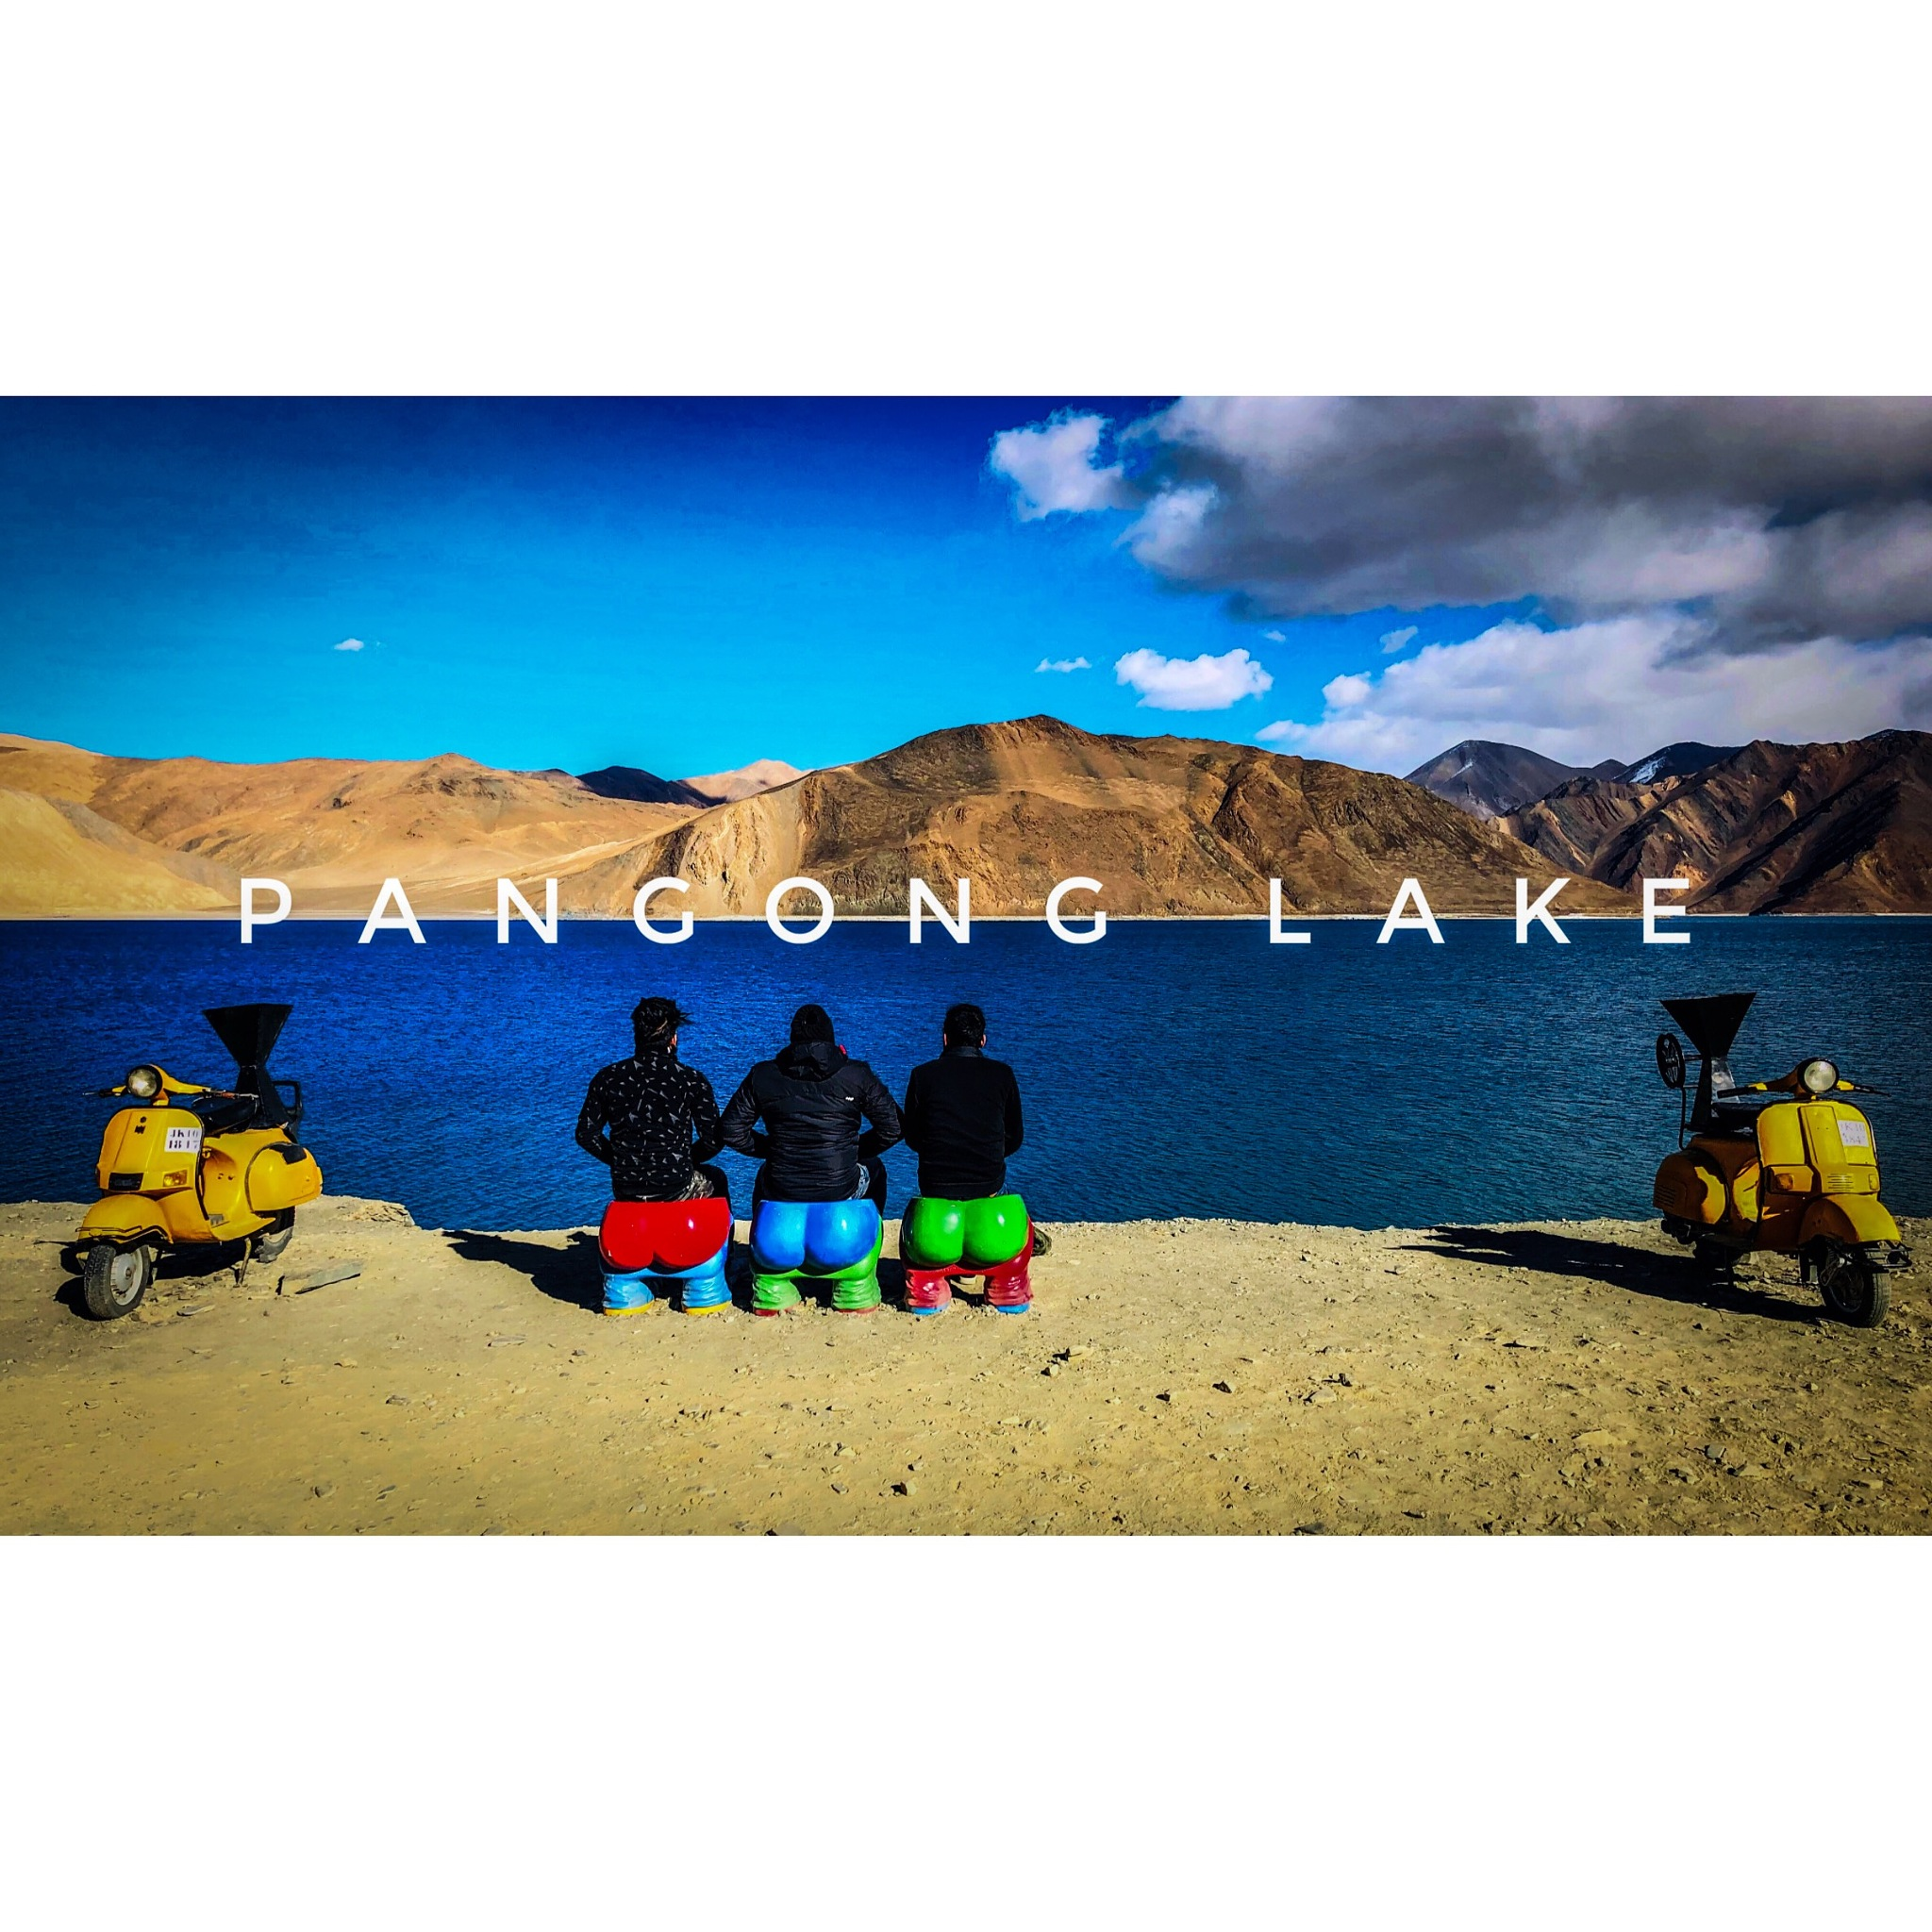 Pangong lake , India by Yaxir Huxxain